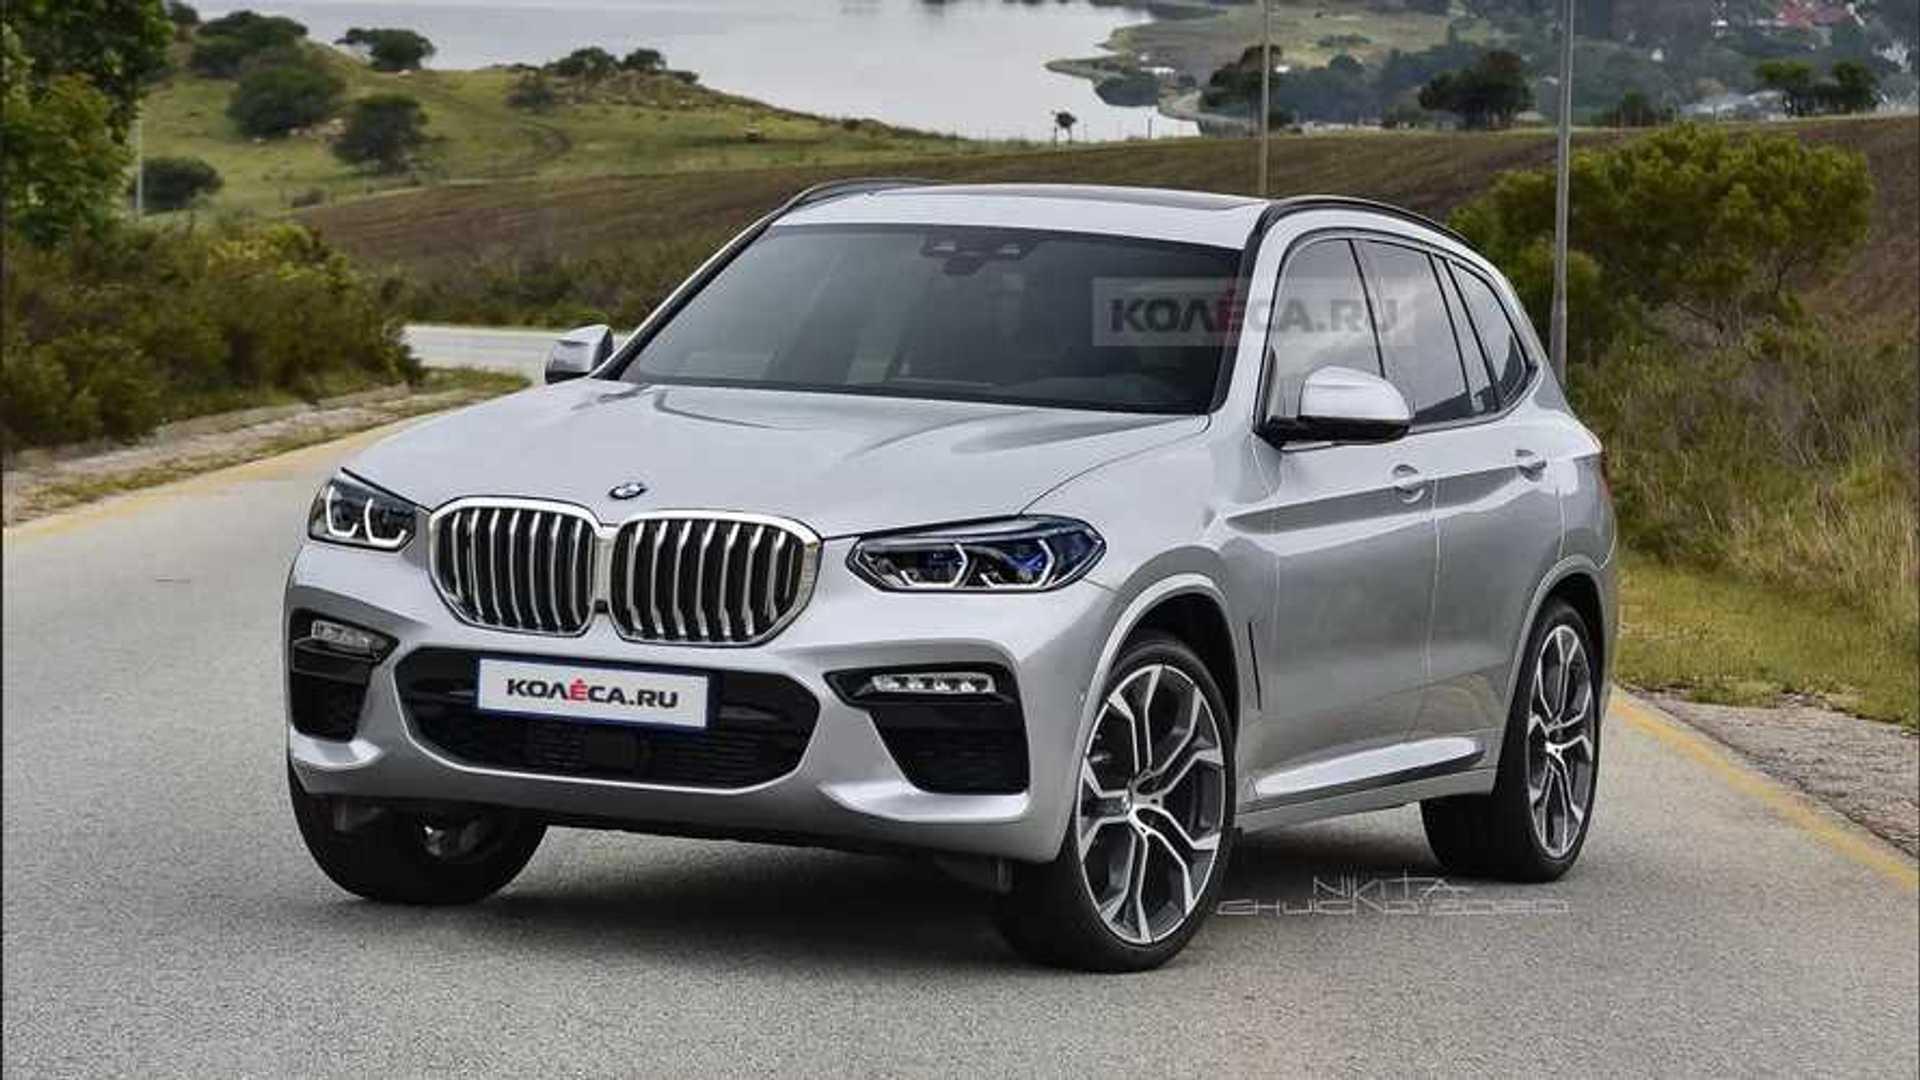 2021 BMW X3 makyajlı gövdesiyle hayal edildi